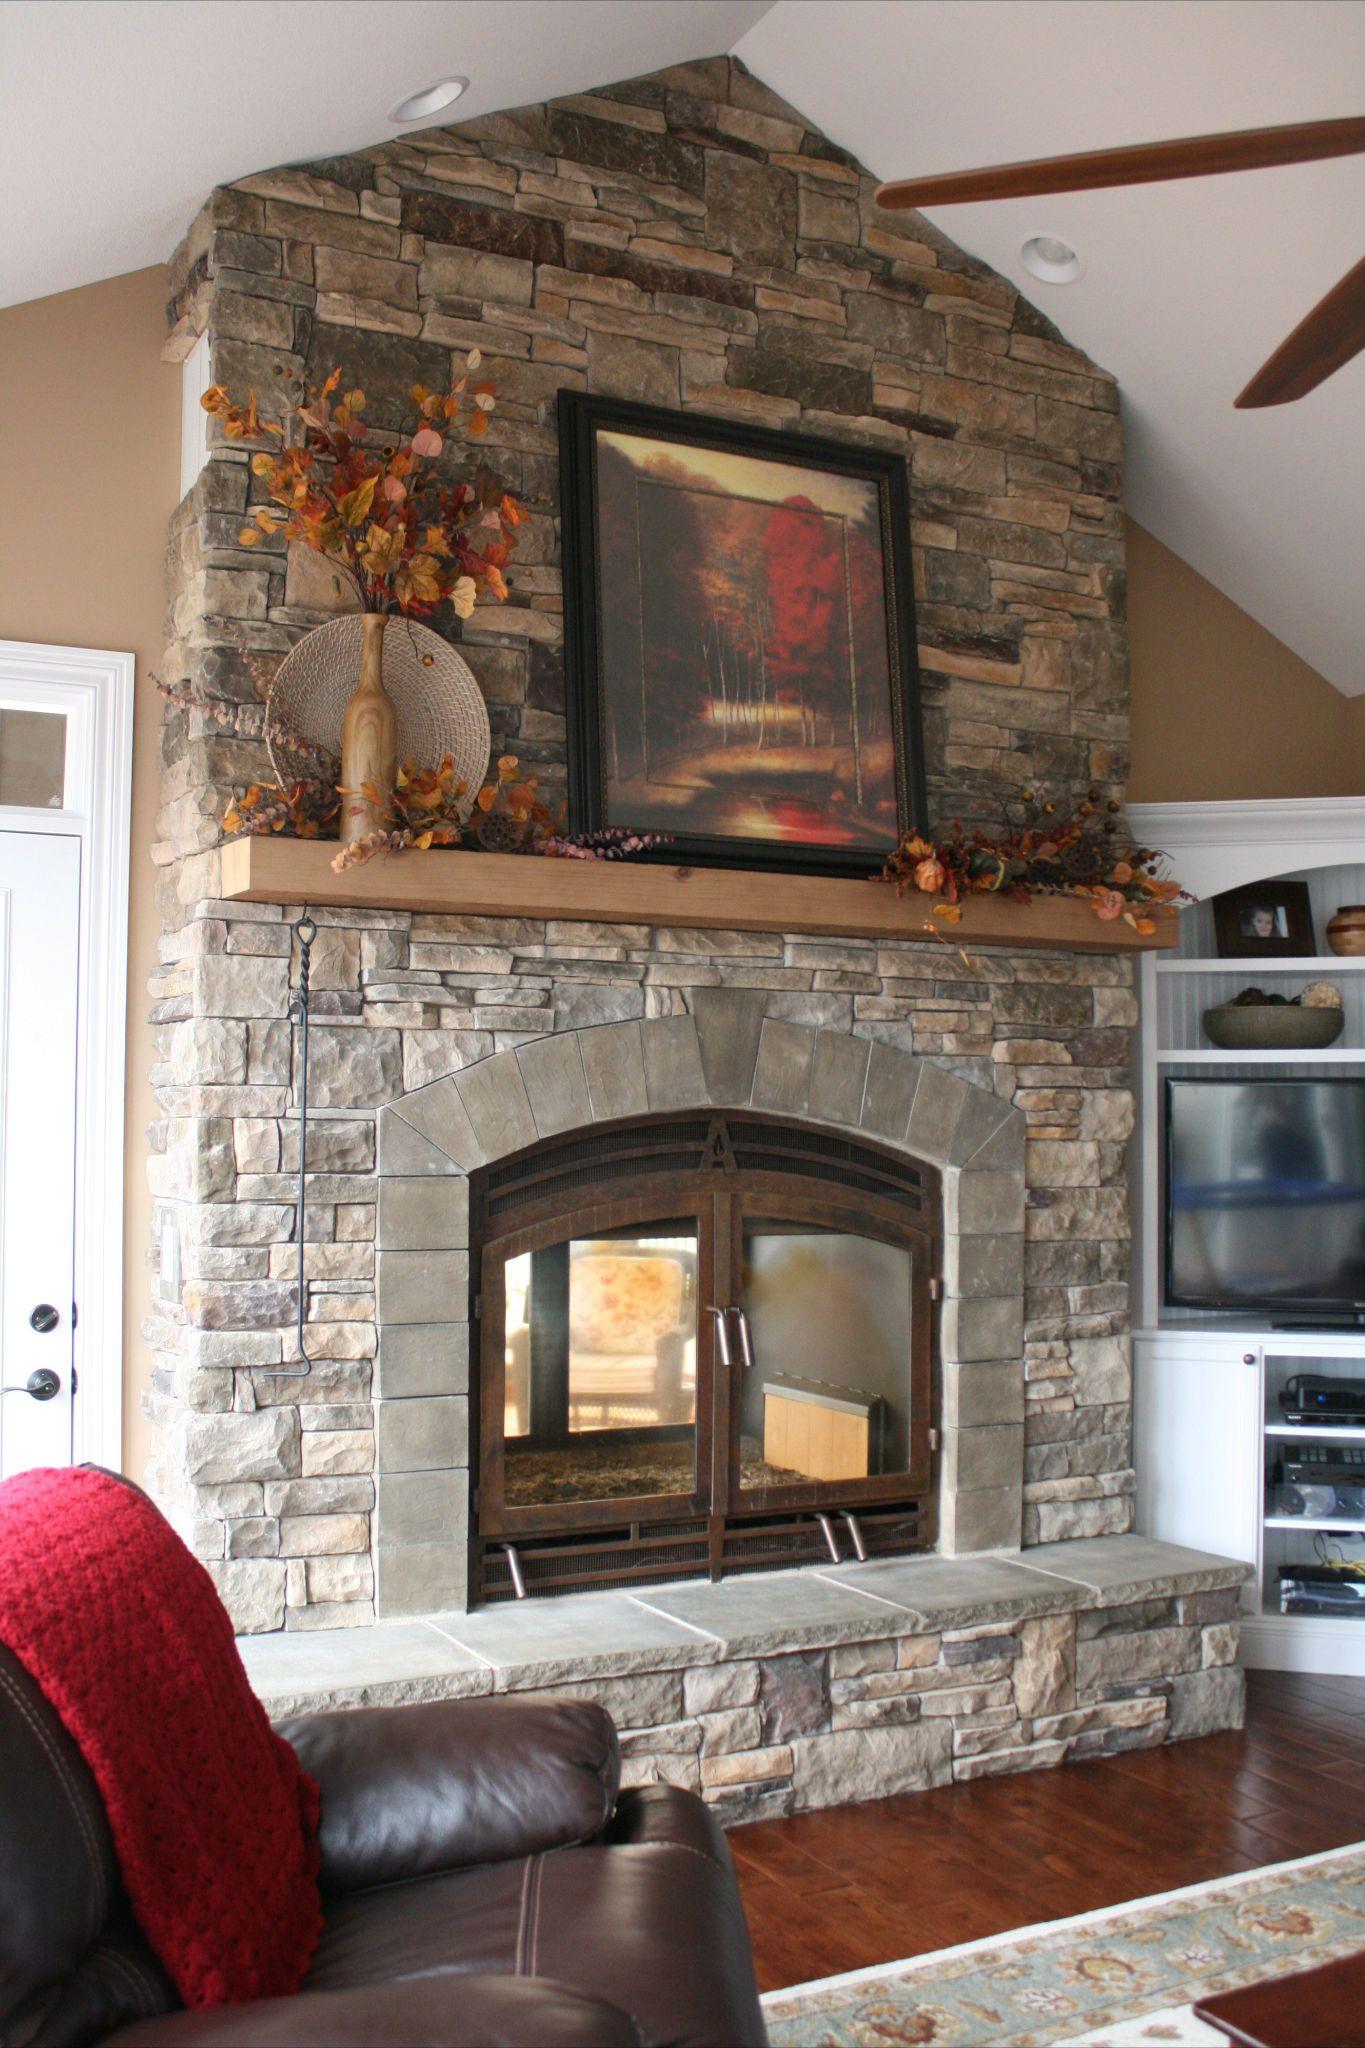 Indoor outdoor see through fireplace building projects for Building an indoor fireplace